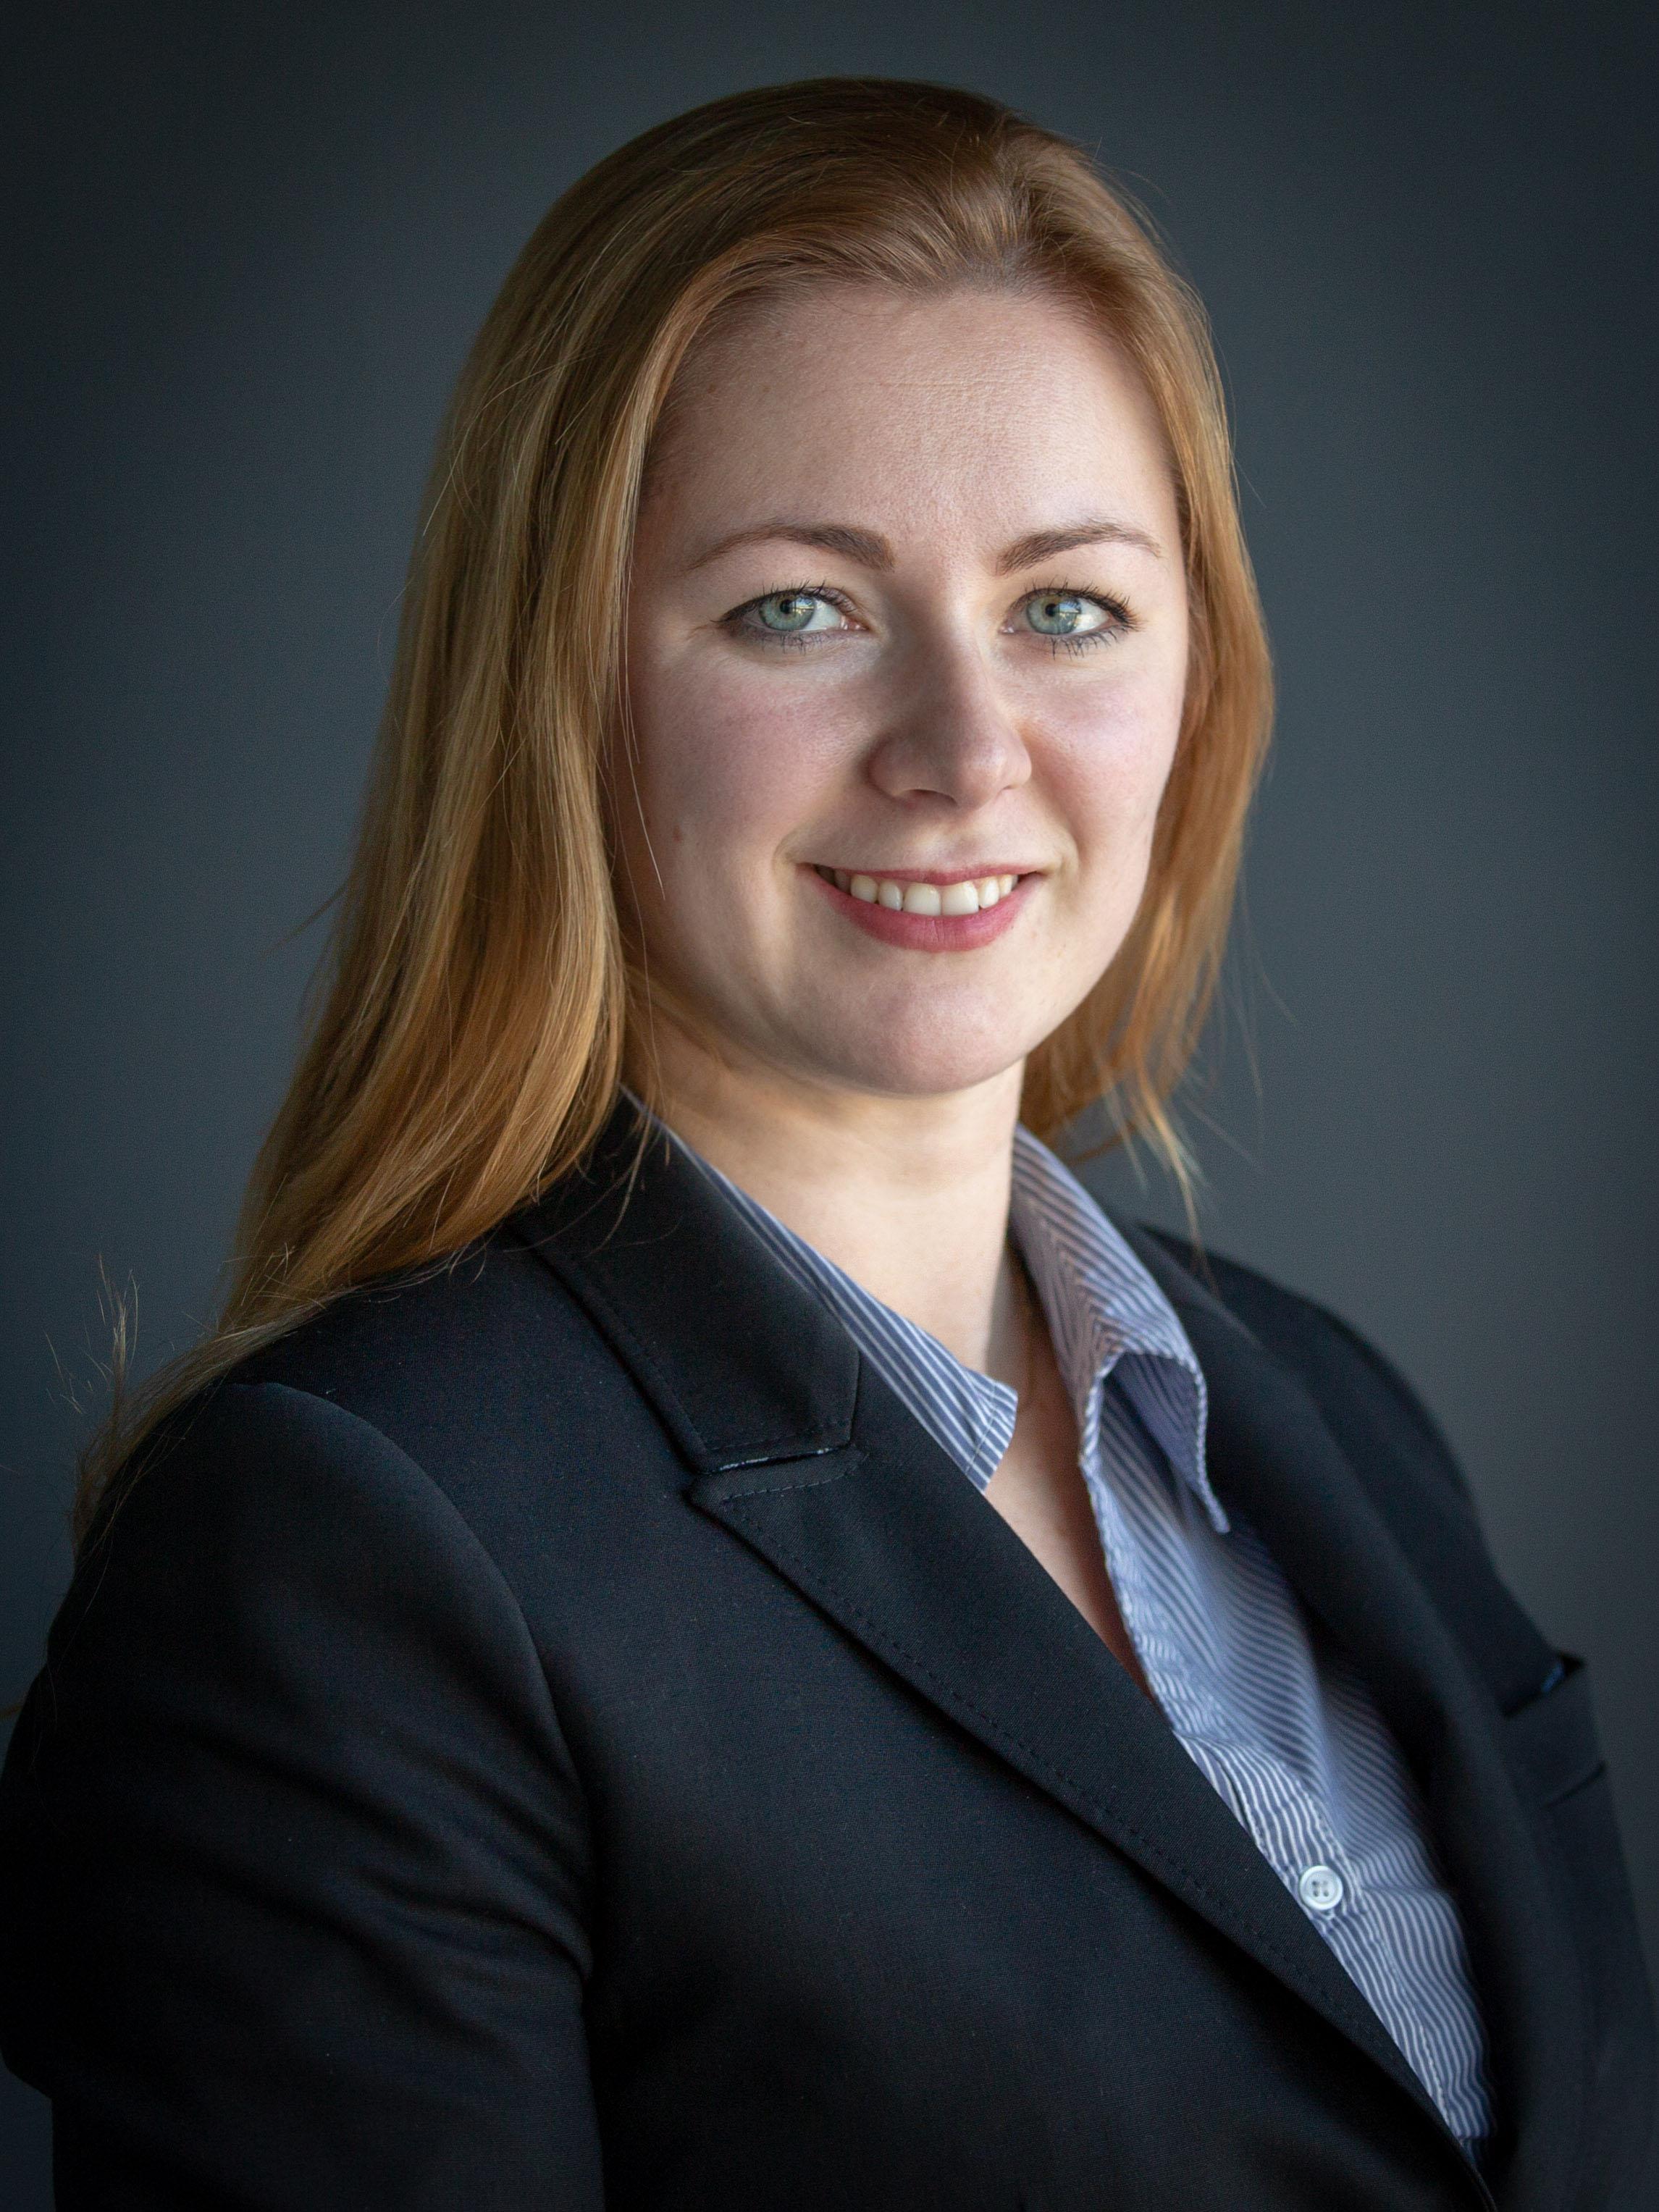 Katka Hoferica